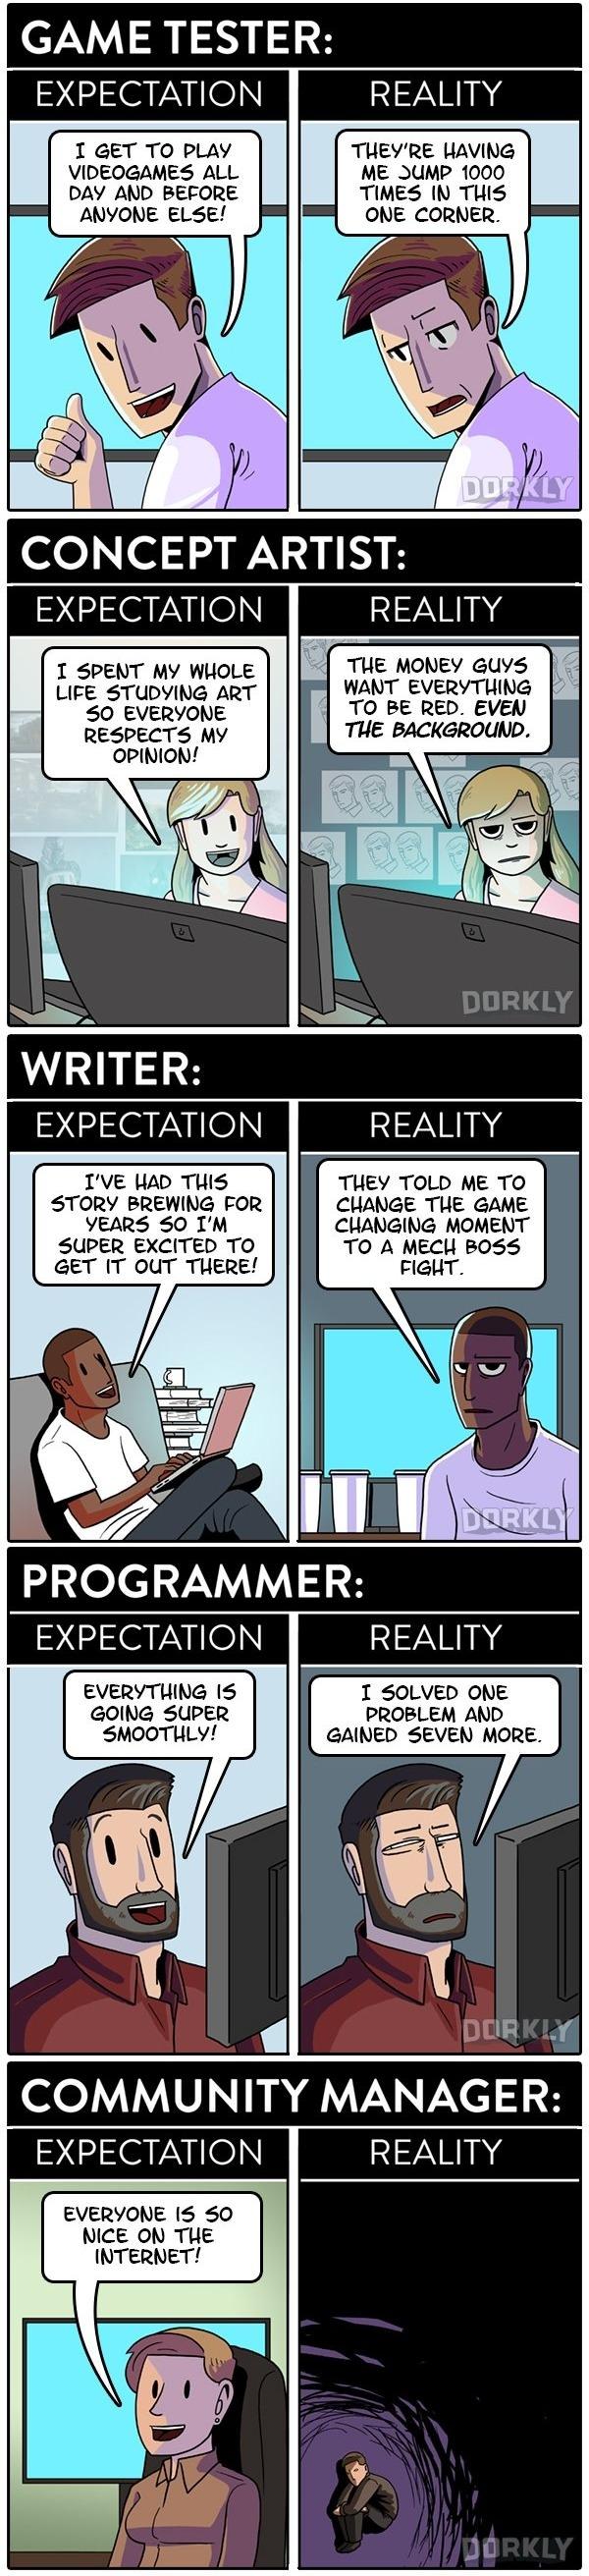 Game tester